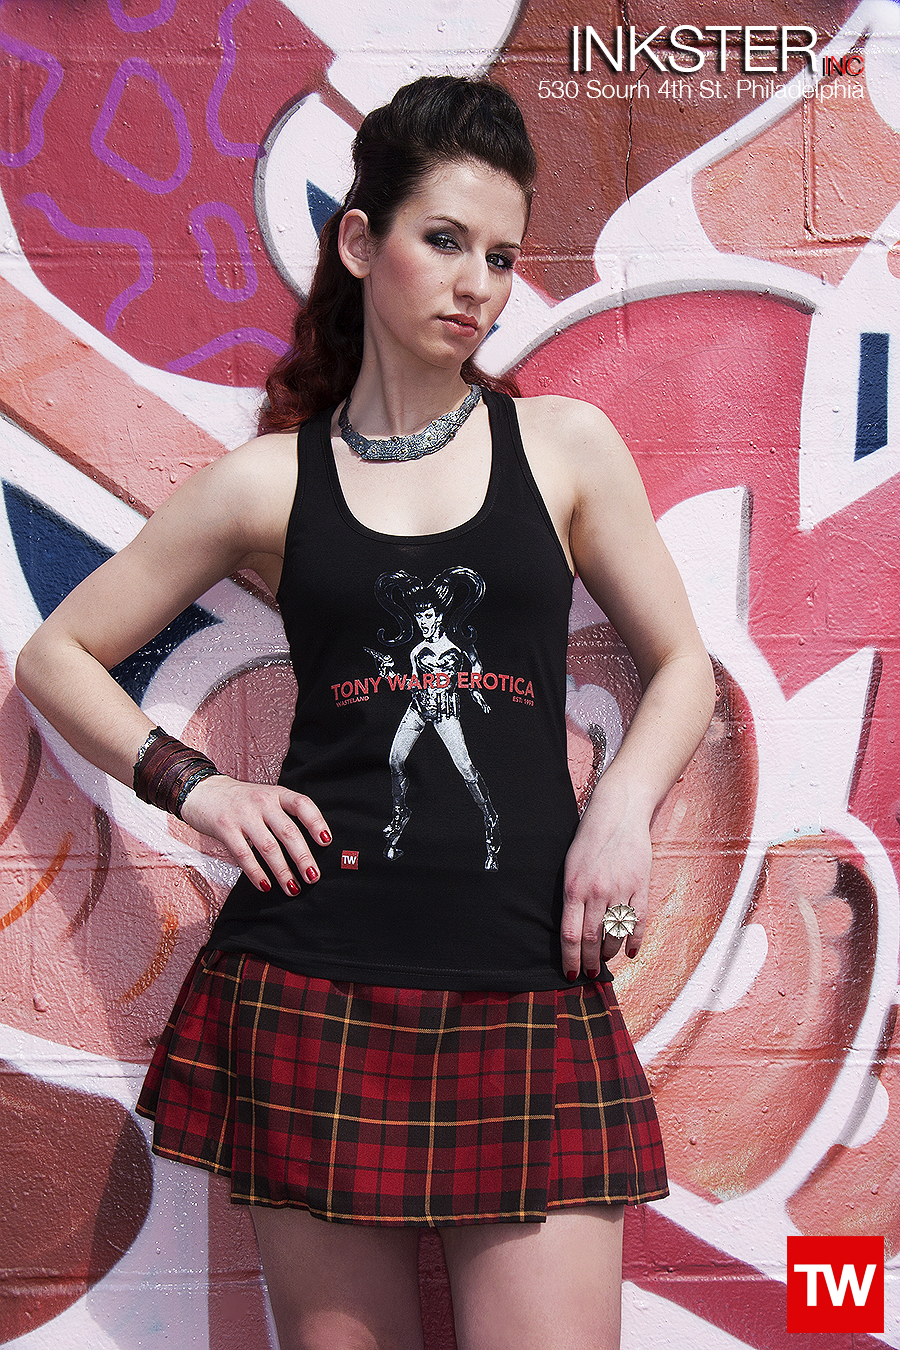 Tony_Ward_Erotica_Wasteland_t-shirt_black_racerback_model_Julia_Craig_stylist_Mindy_Chandler_grafitti_walls_philly_cecil_b_moore_fashion_traditional_kilt